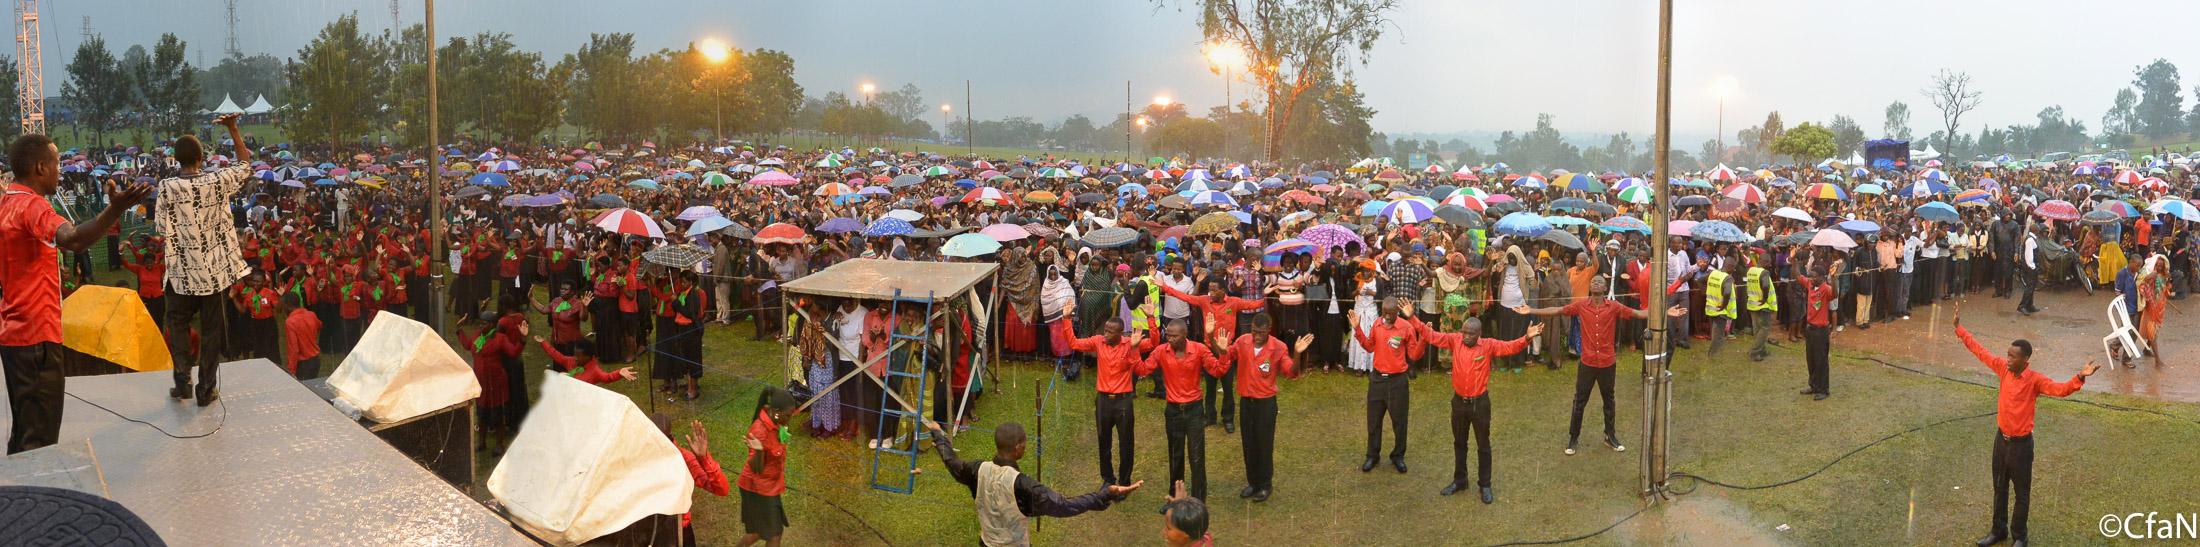 Uganda-Mbarara-2015-D2-1-665 Panorama